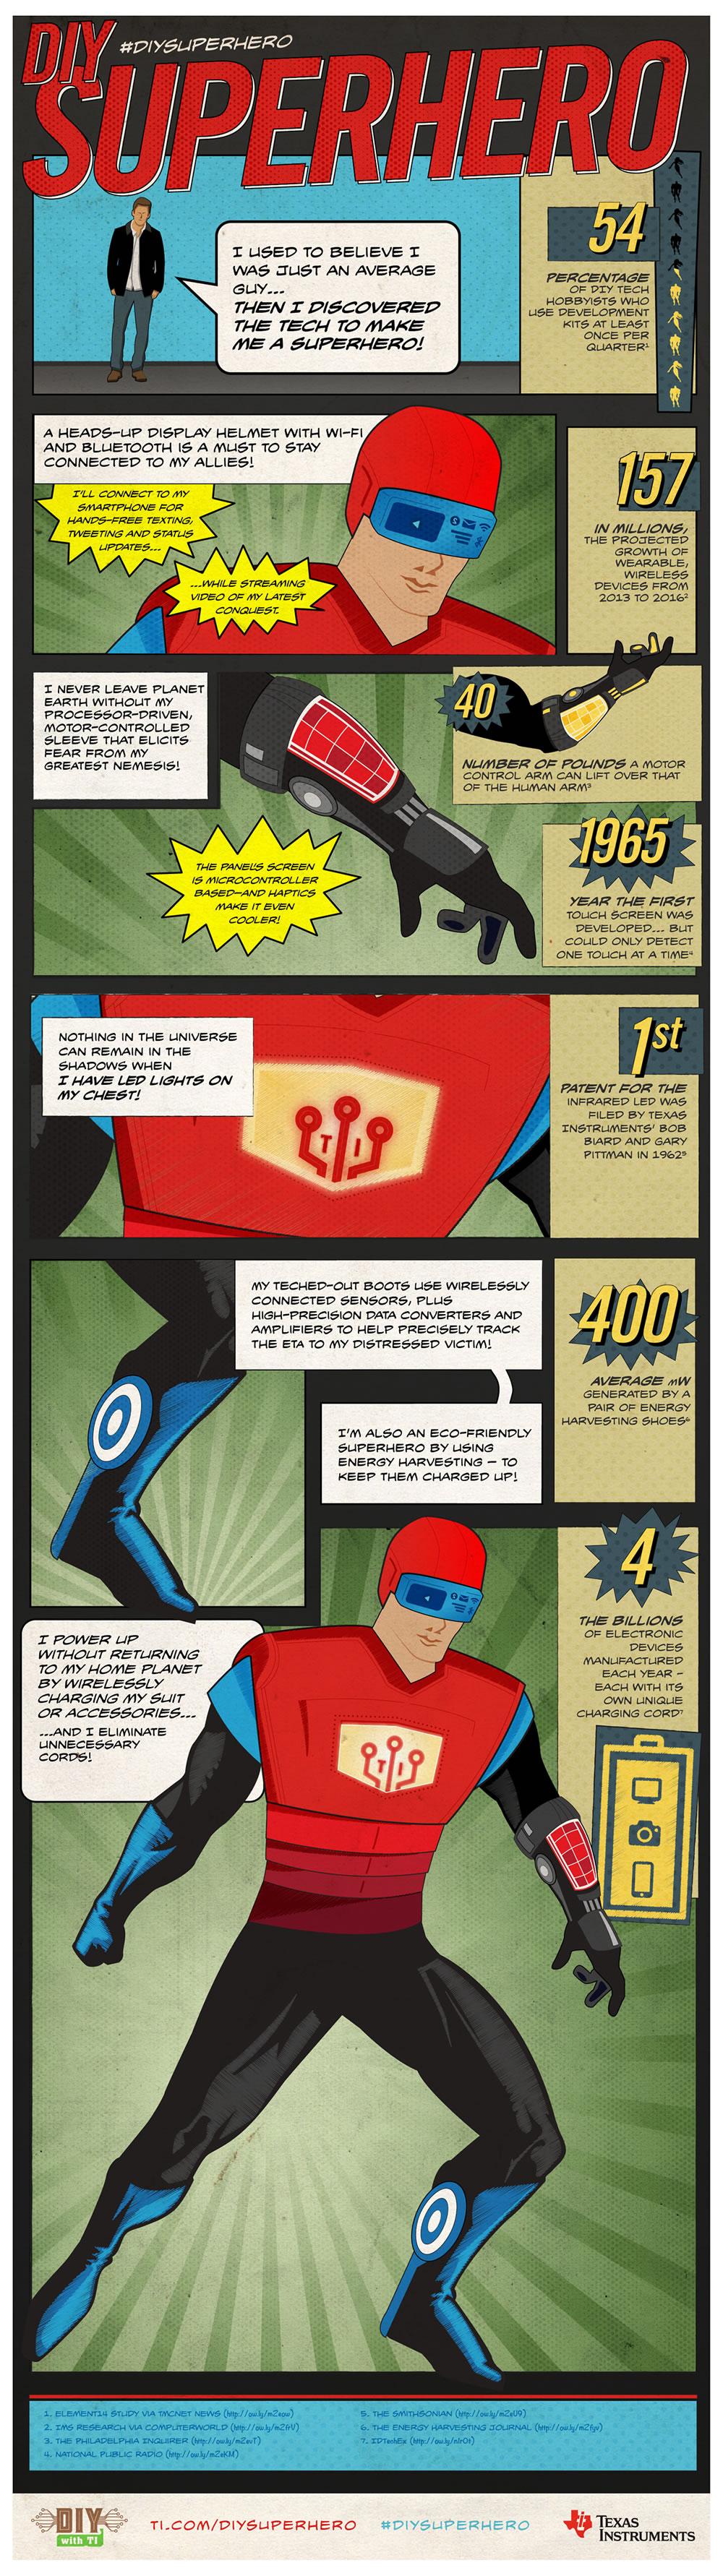 diy-superhero-technologies-list-infographic